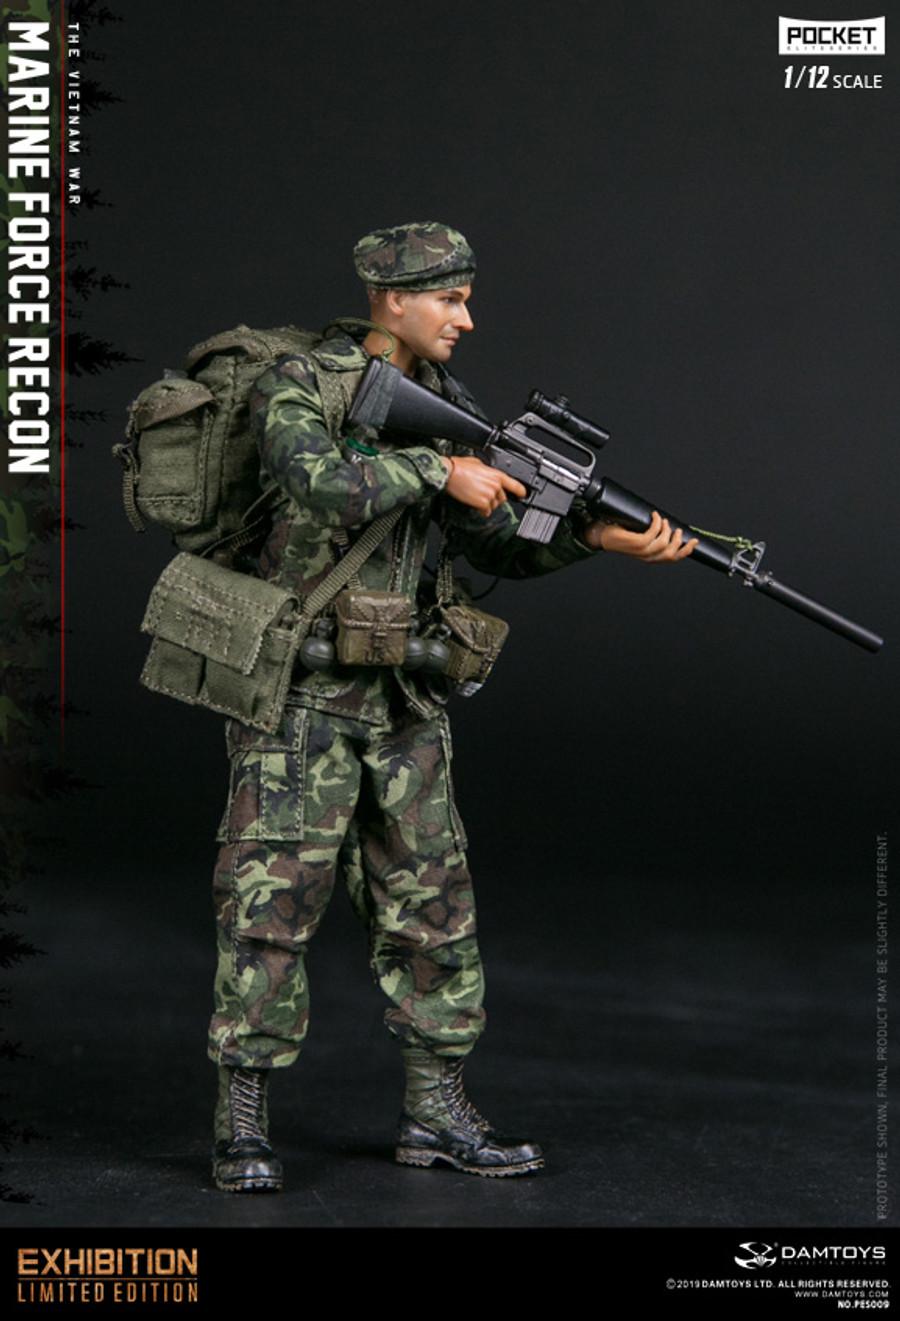 DAM Toys - 1/12 Pocket Elite Series: Marine Force Recon In Vietnam